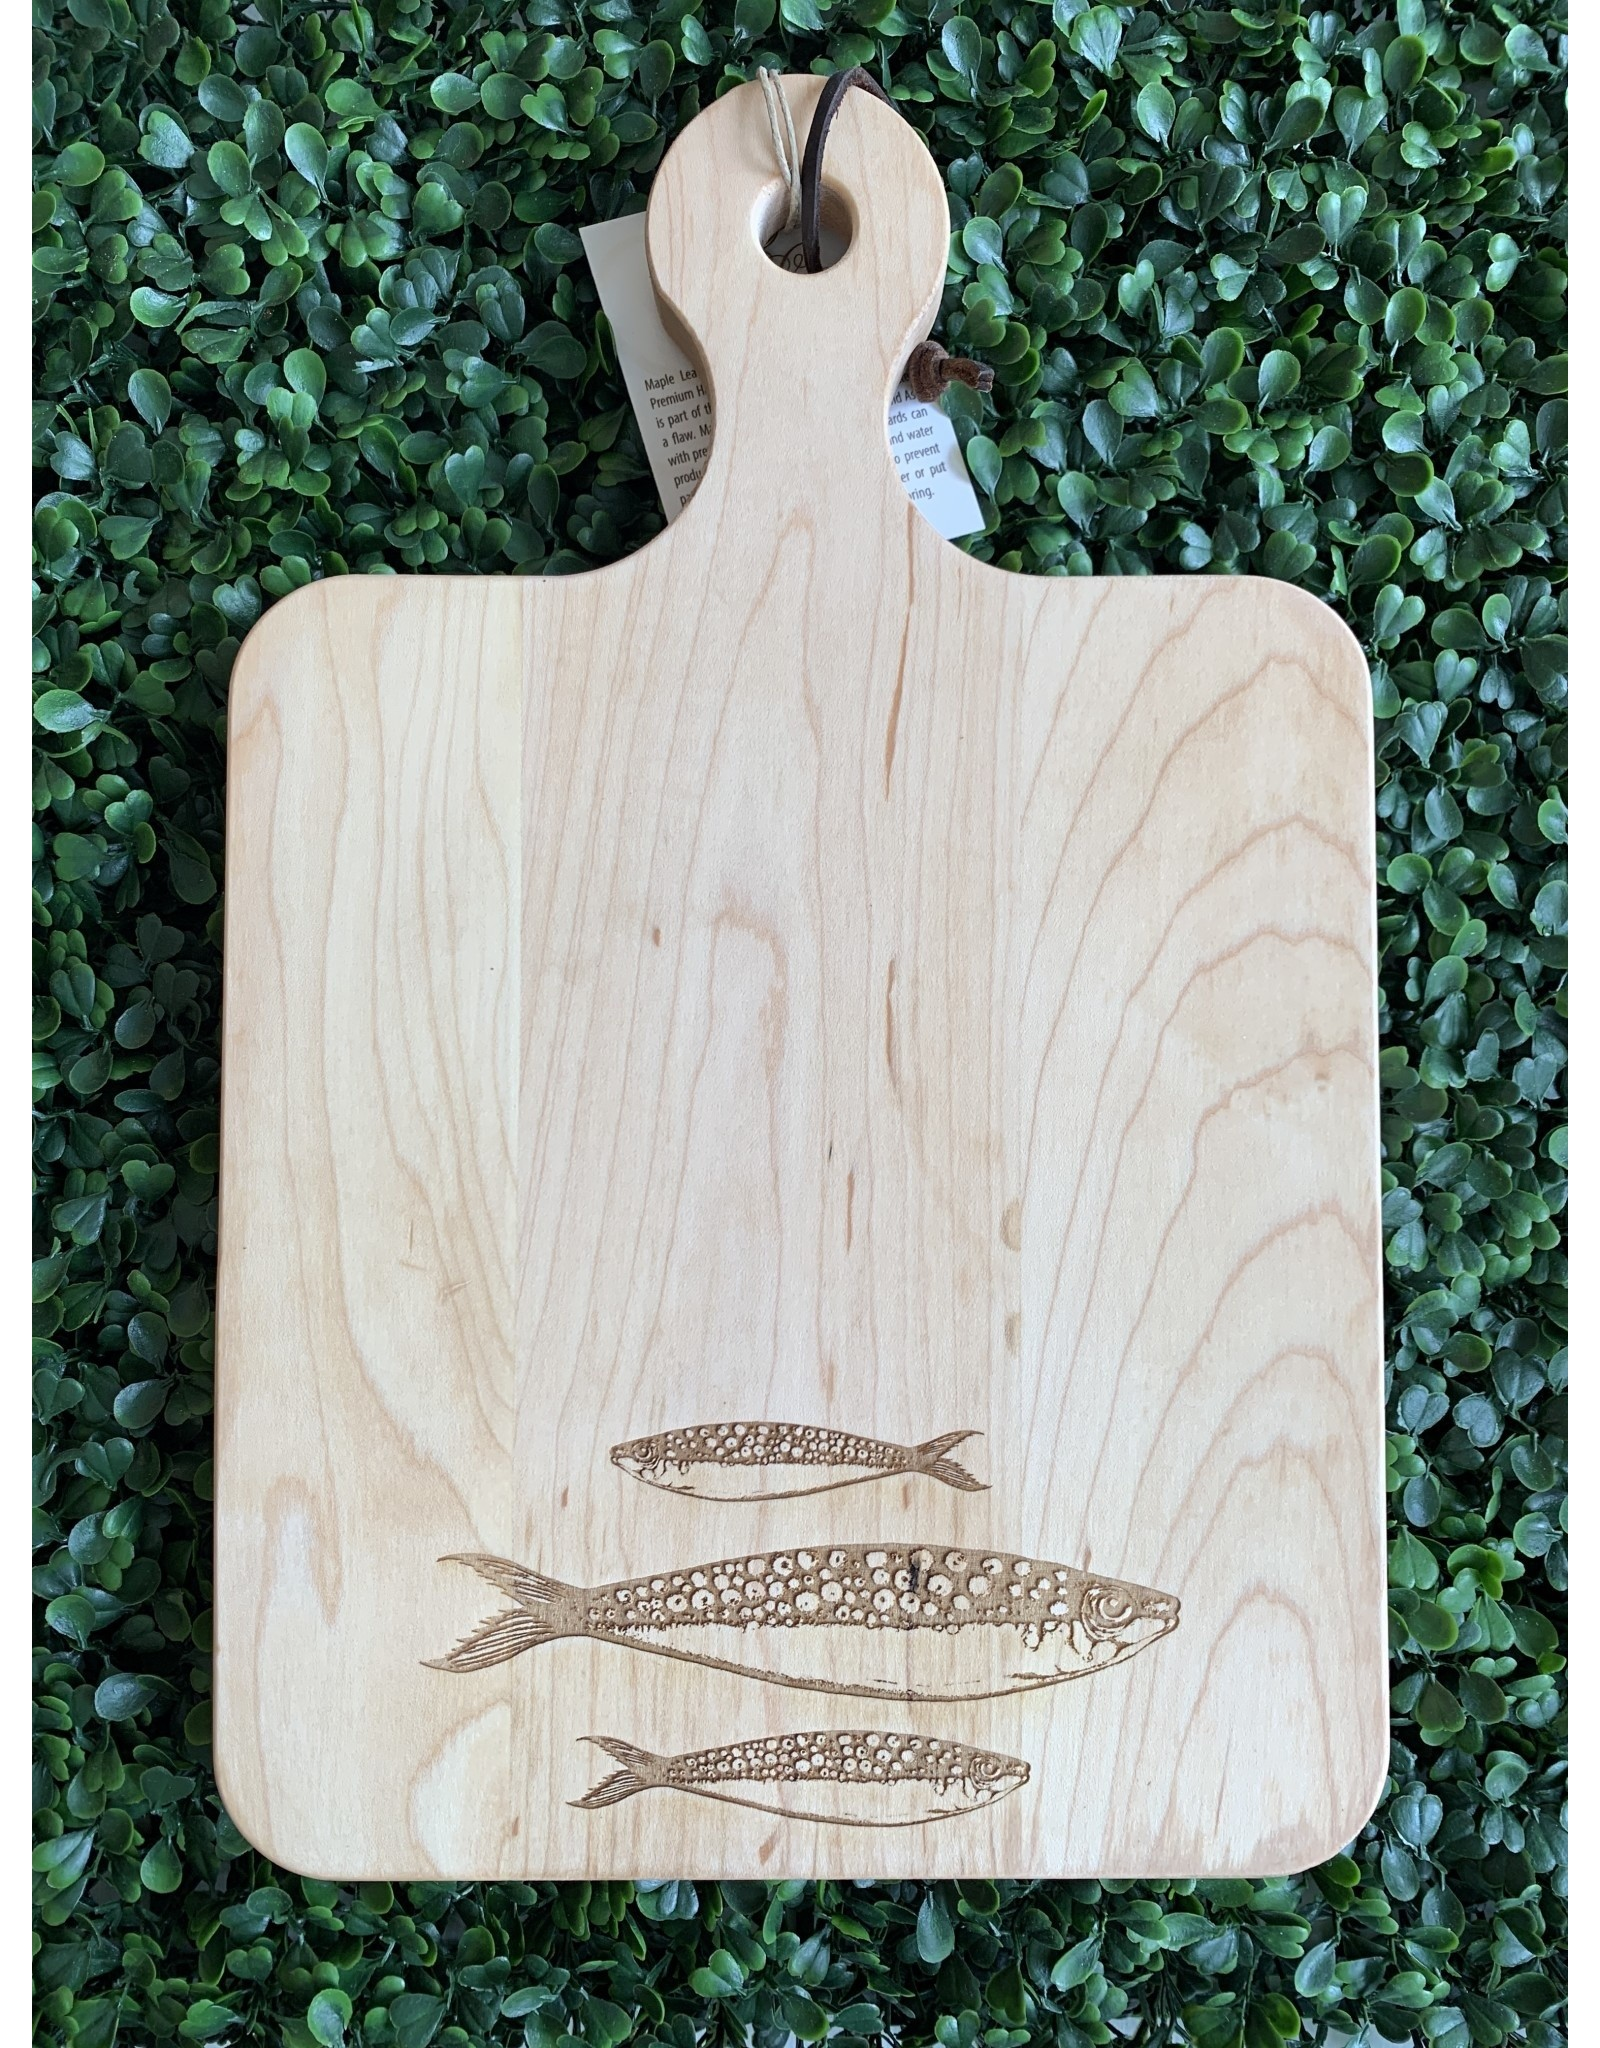 Maple Leaf at Home Fish Trio 14 x 9 Maple Cutting Board